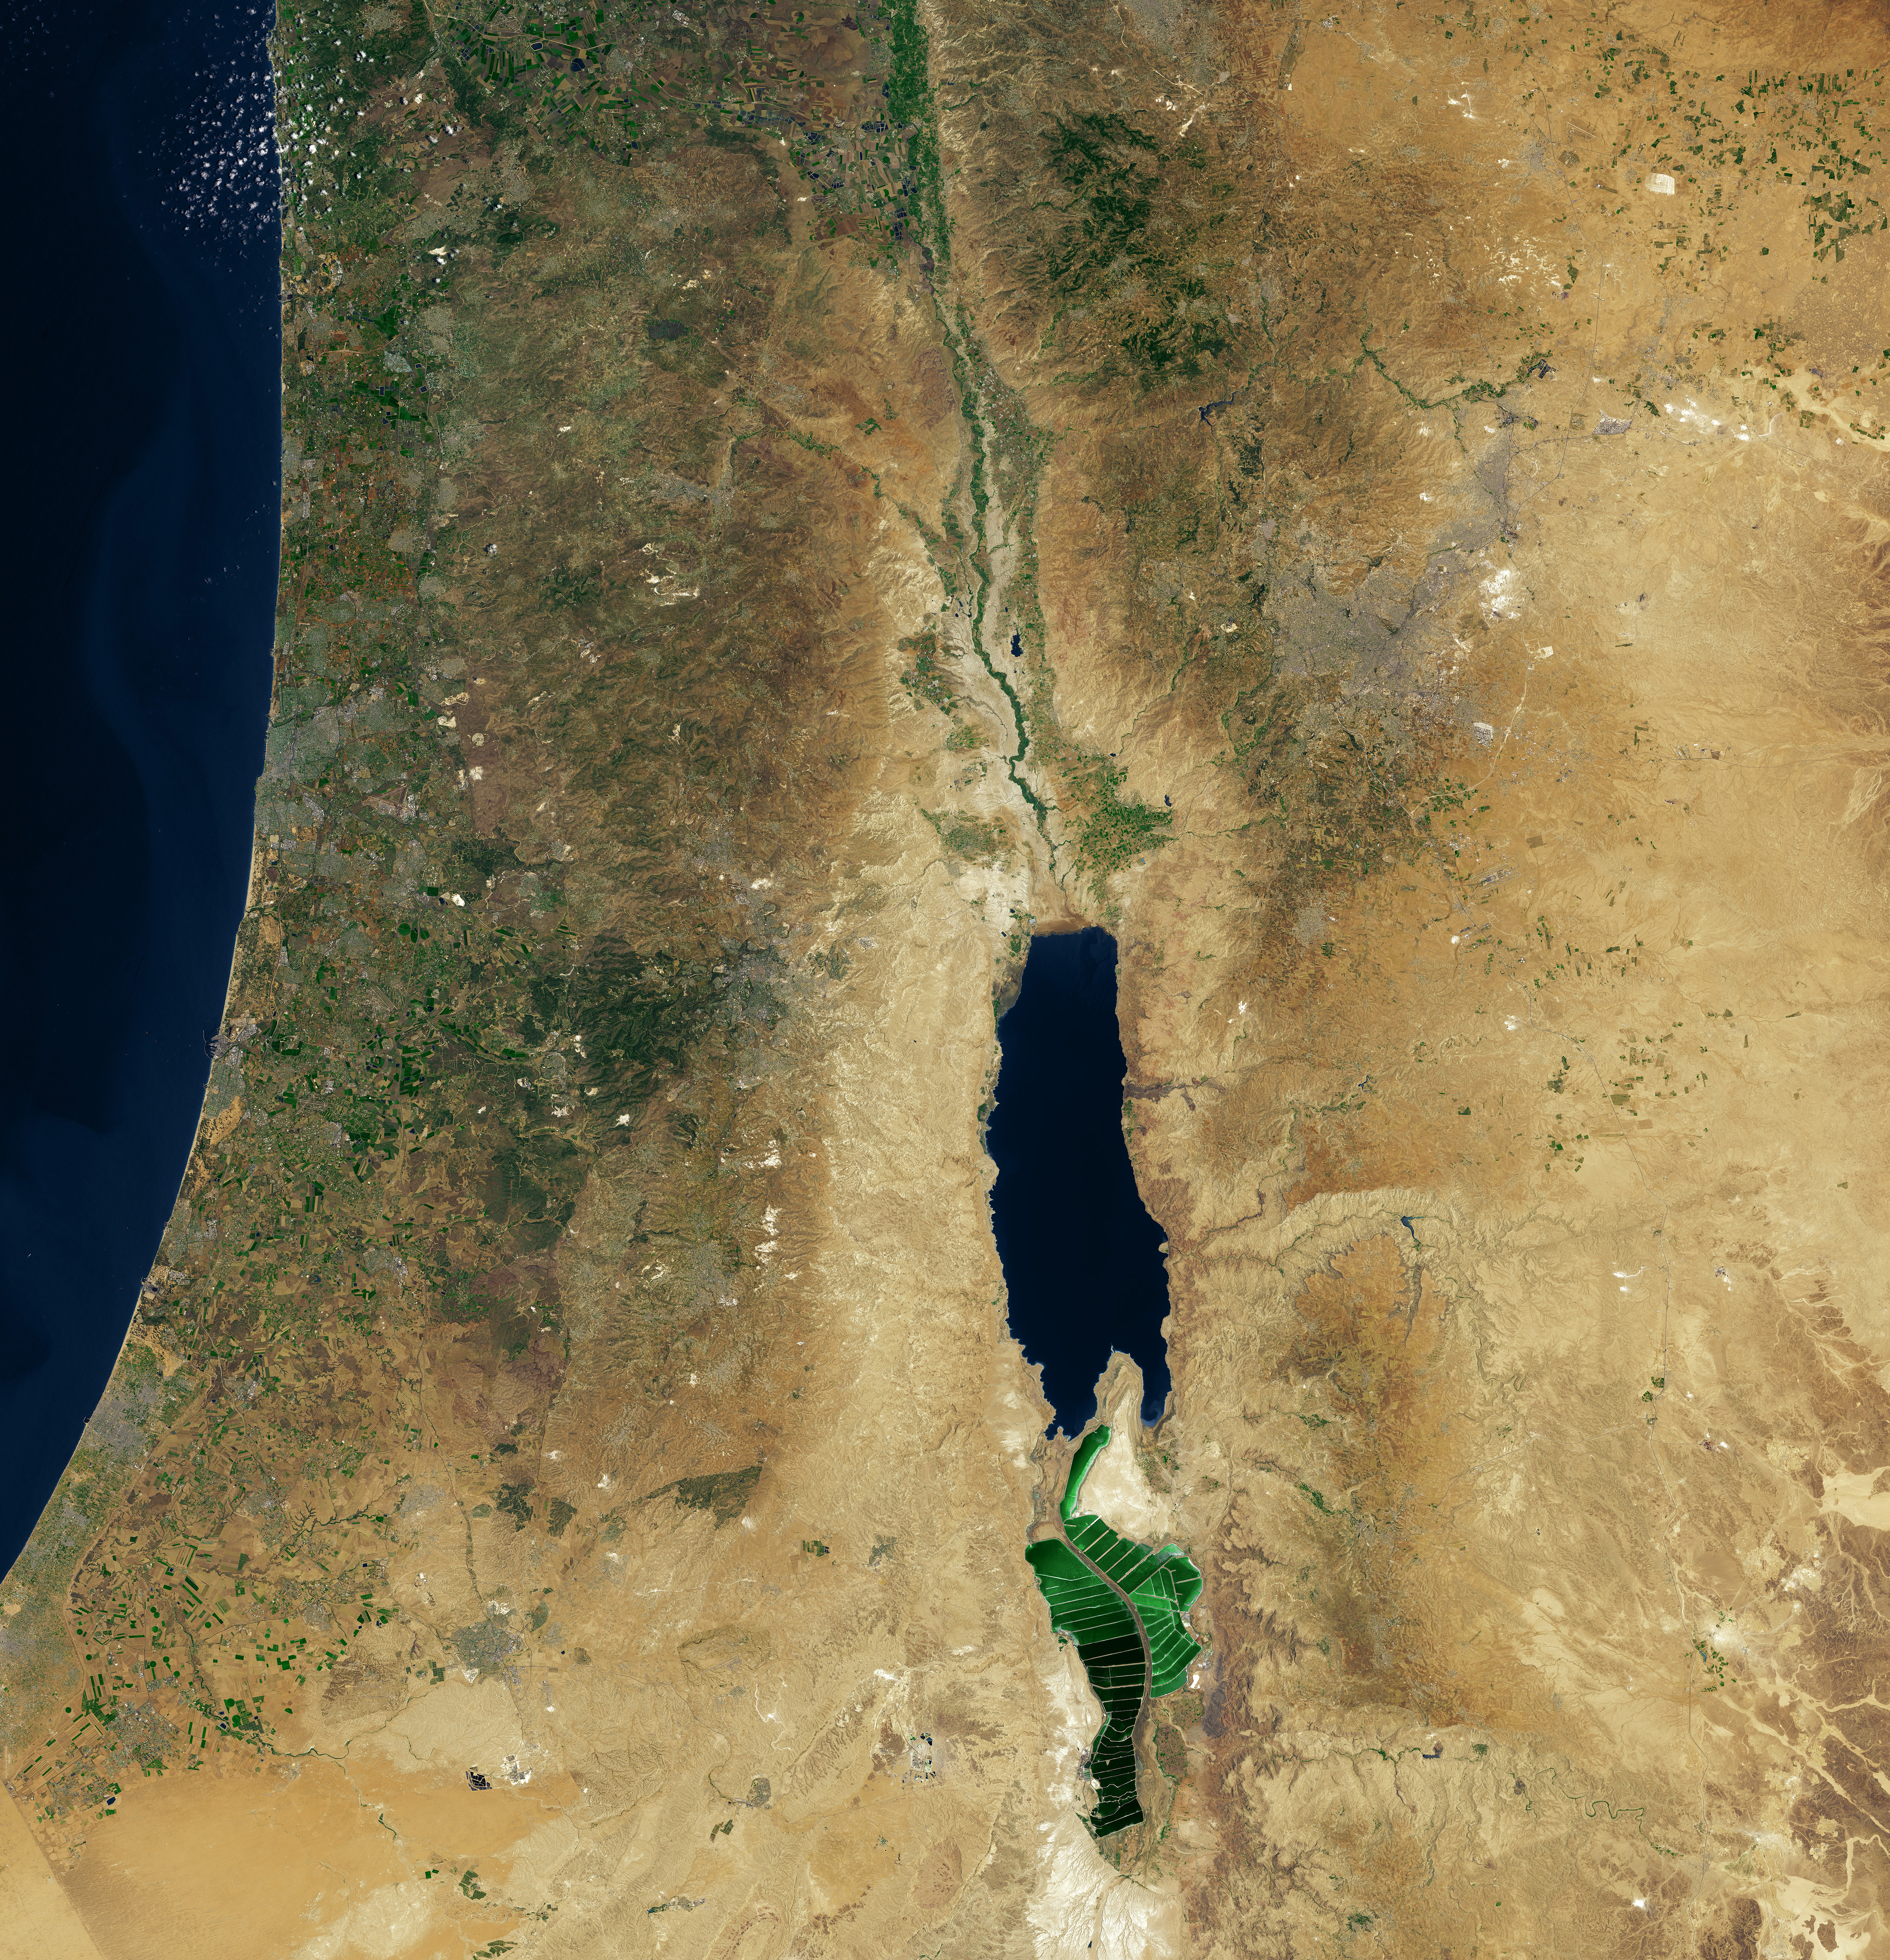 Middle East Map Dead Sea.Esa Image Dead Sea Middle East